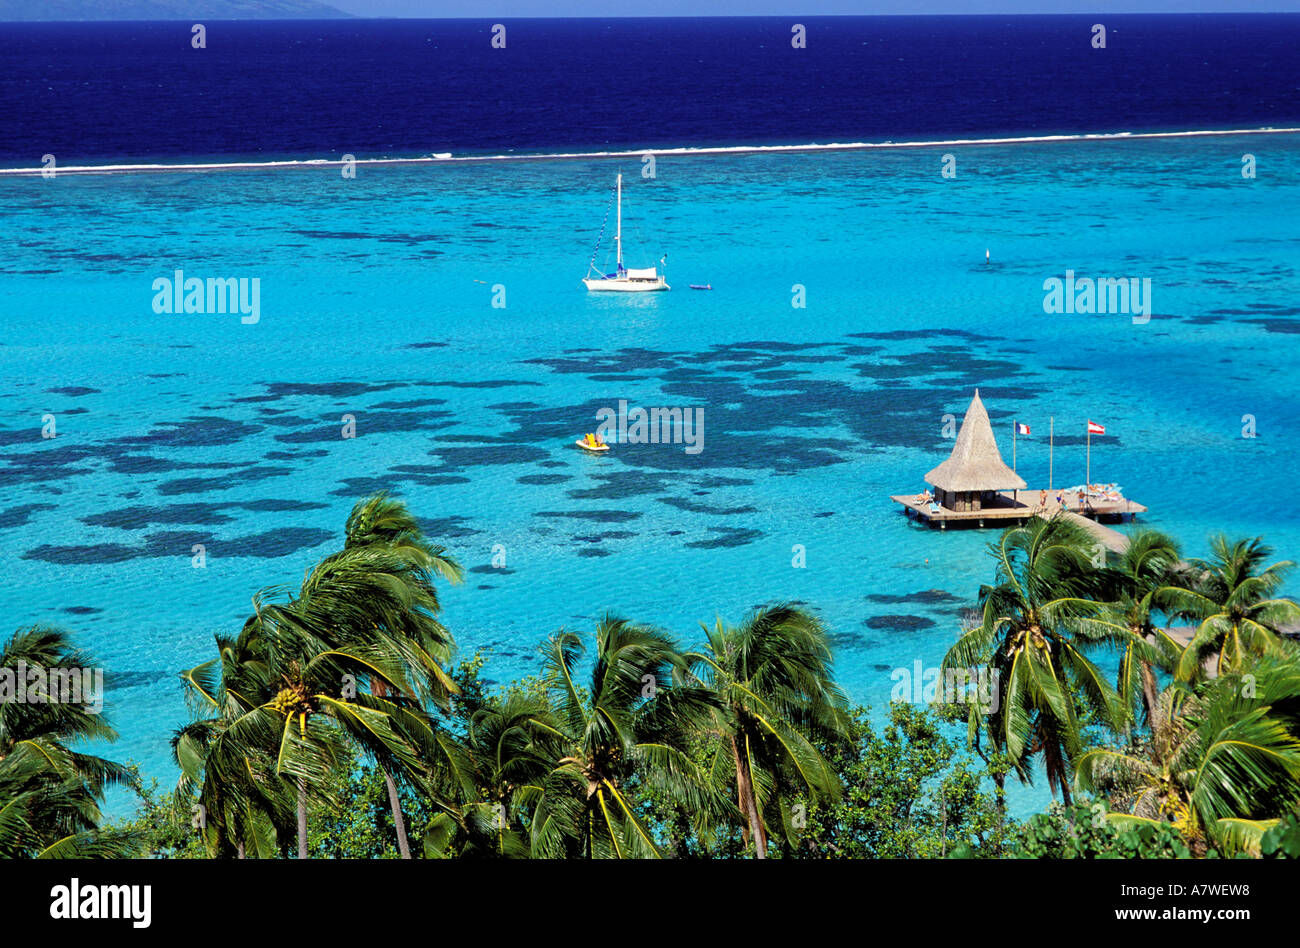 France French Polynesia Moorea Island Sofitel Ia Ora